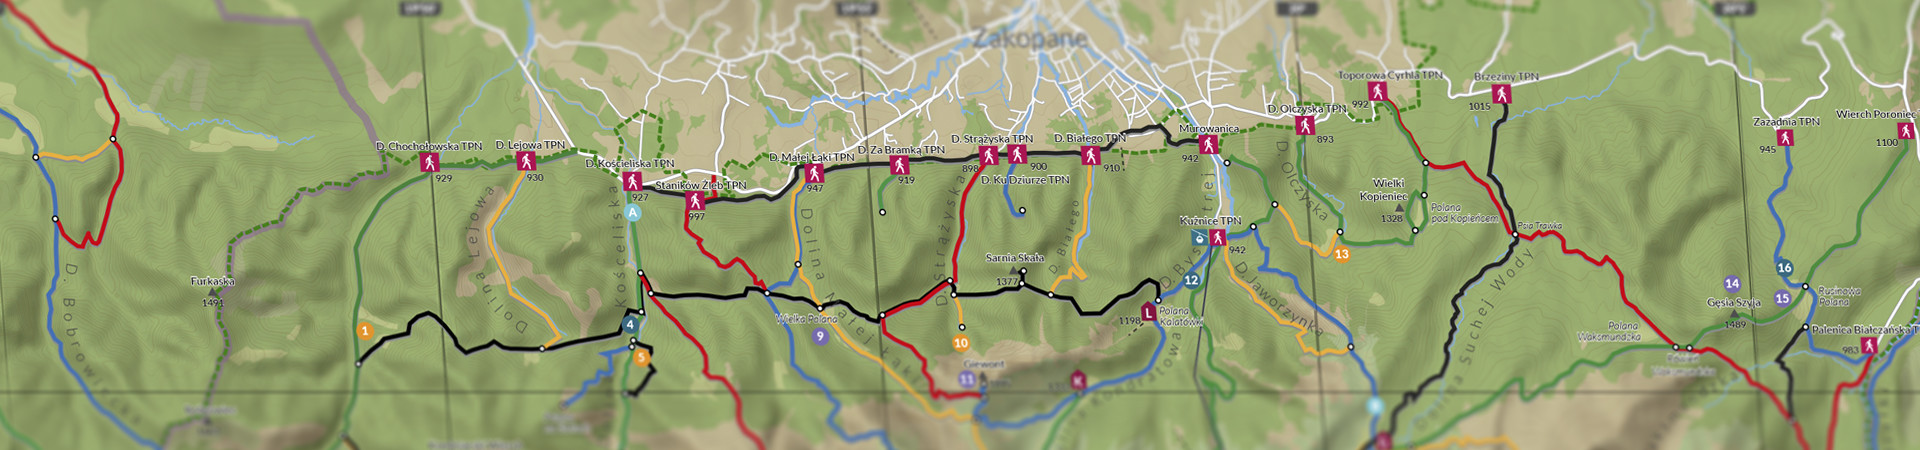 mapa_Zakopane_1